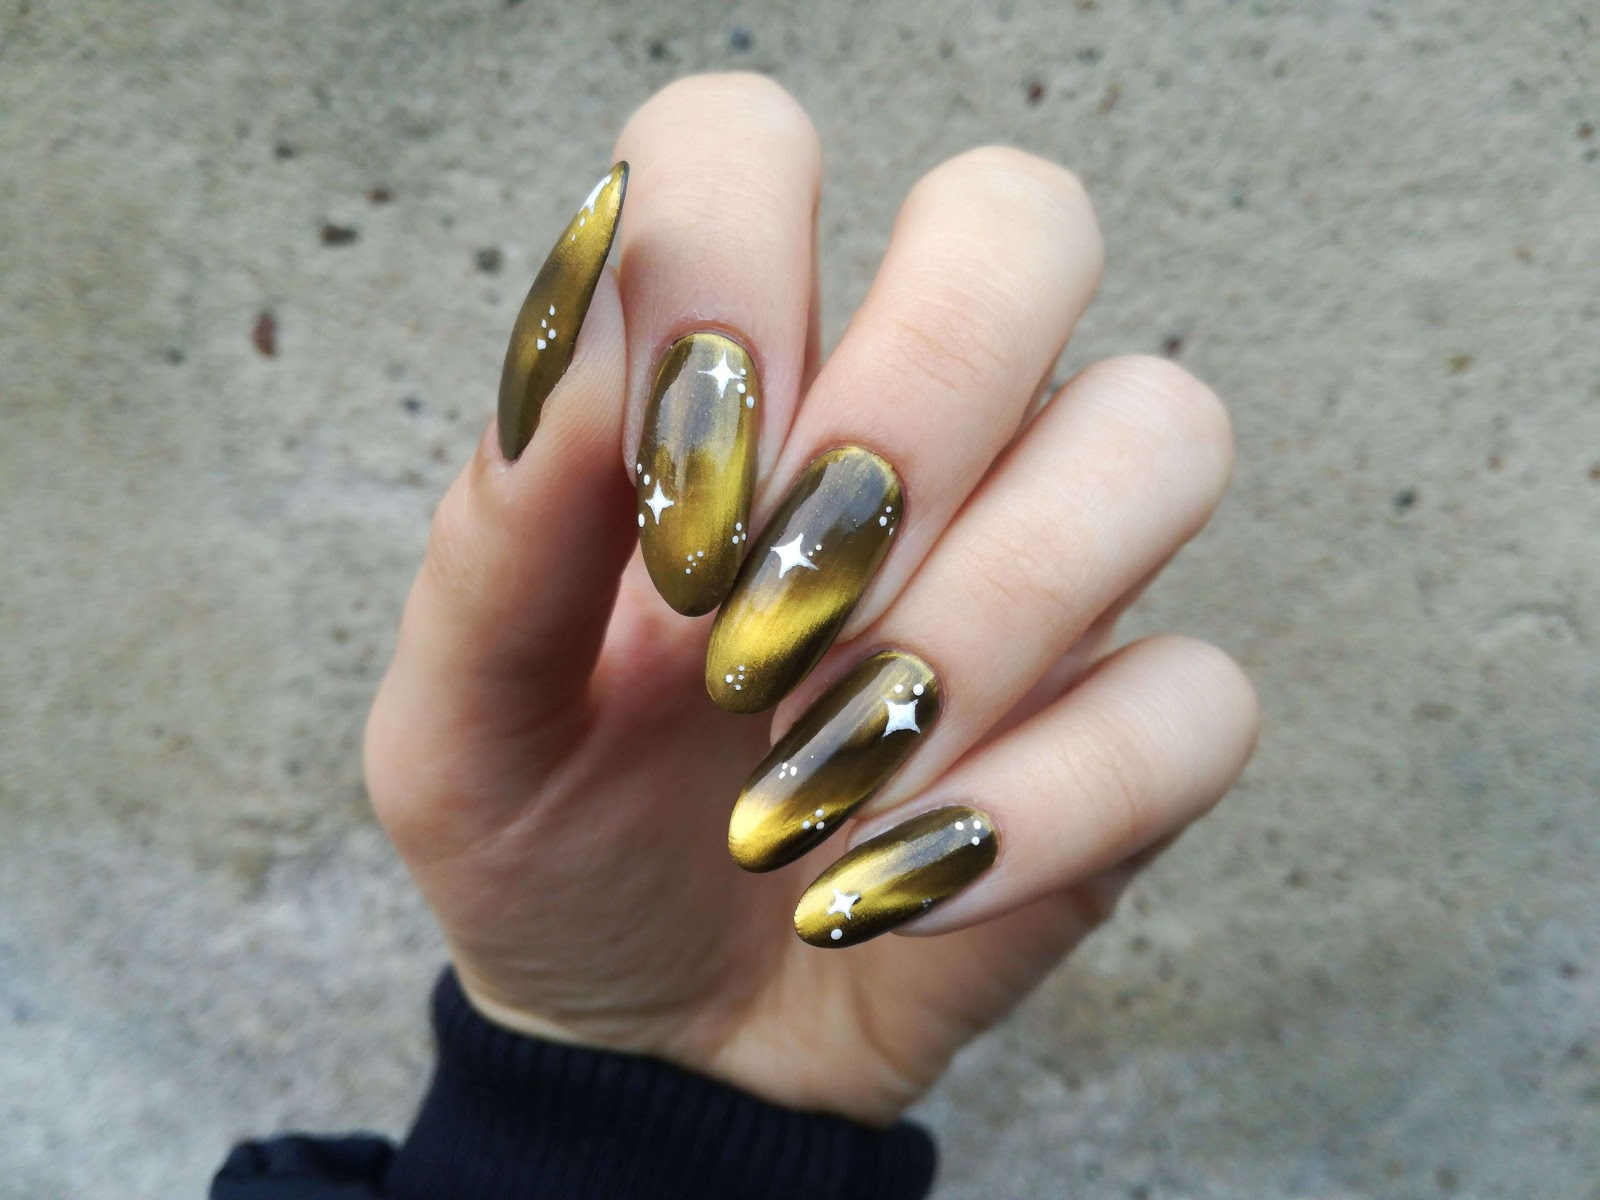 paznokcie kocie oczko